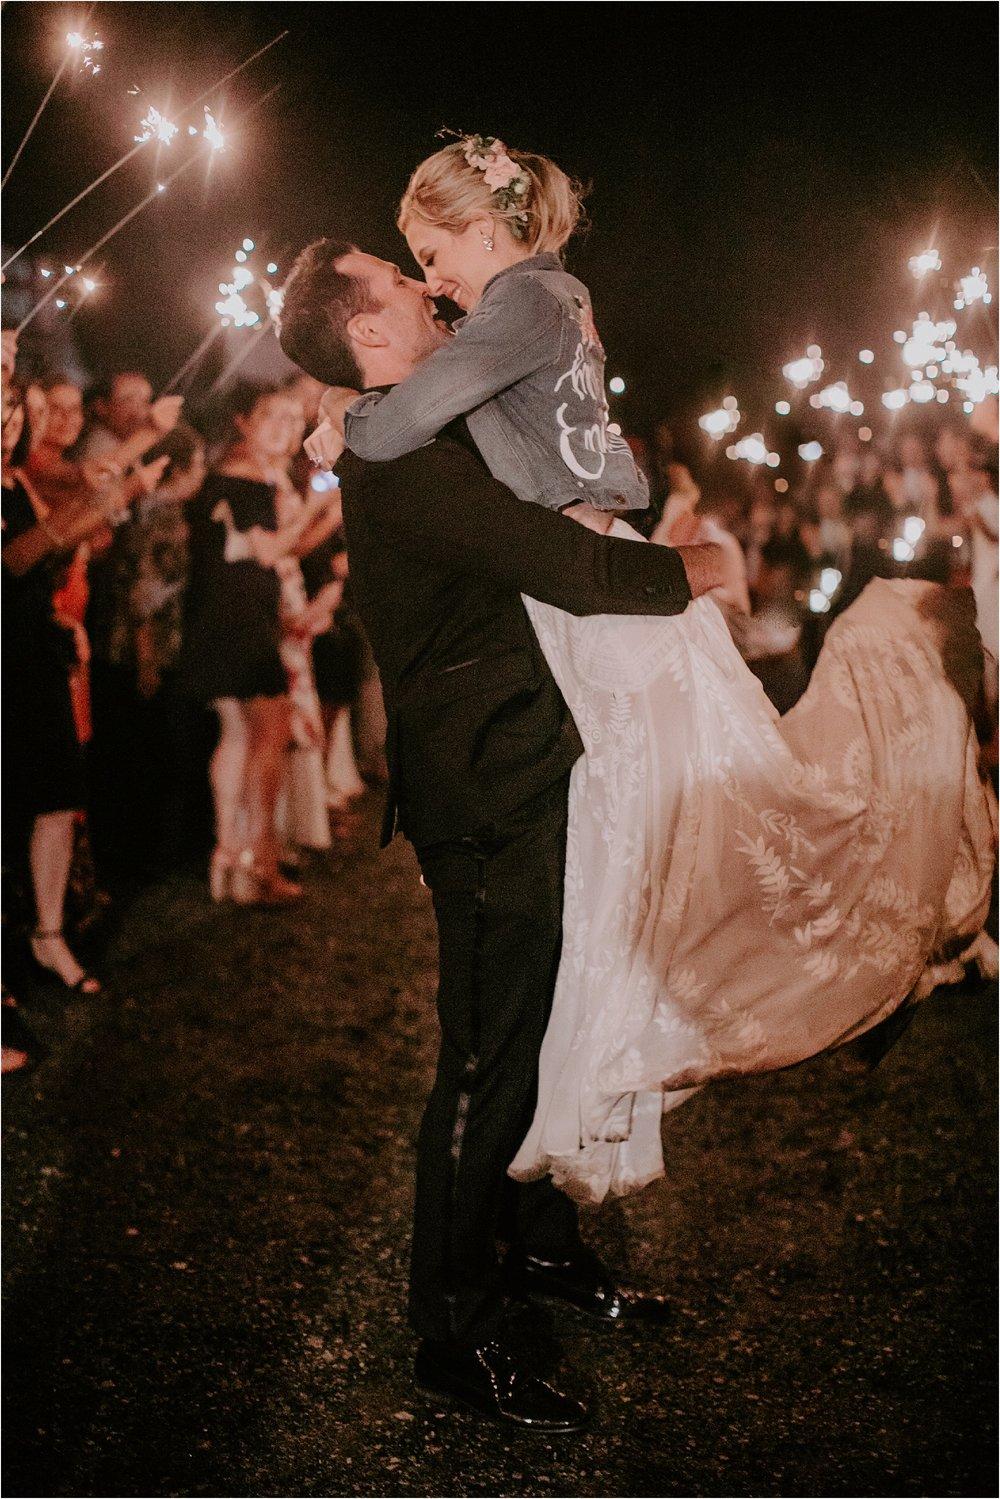 Sarah_Brookhart_Hortulus_Farm_Garden_and_Nursey_Wedding_Photographer_0082.jpg